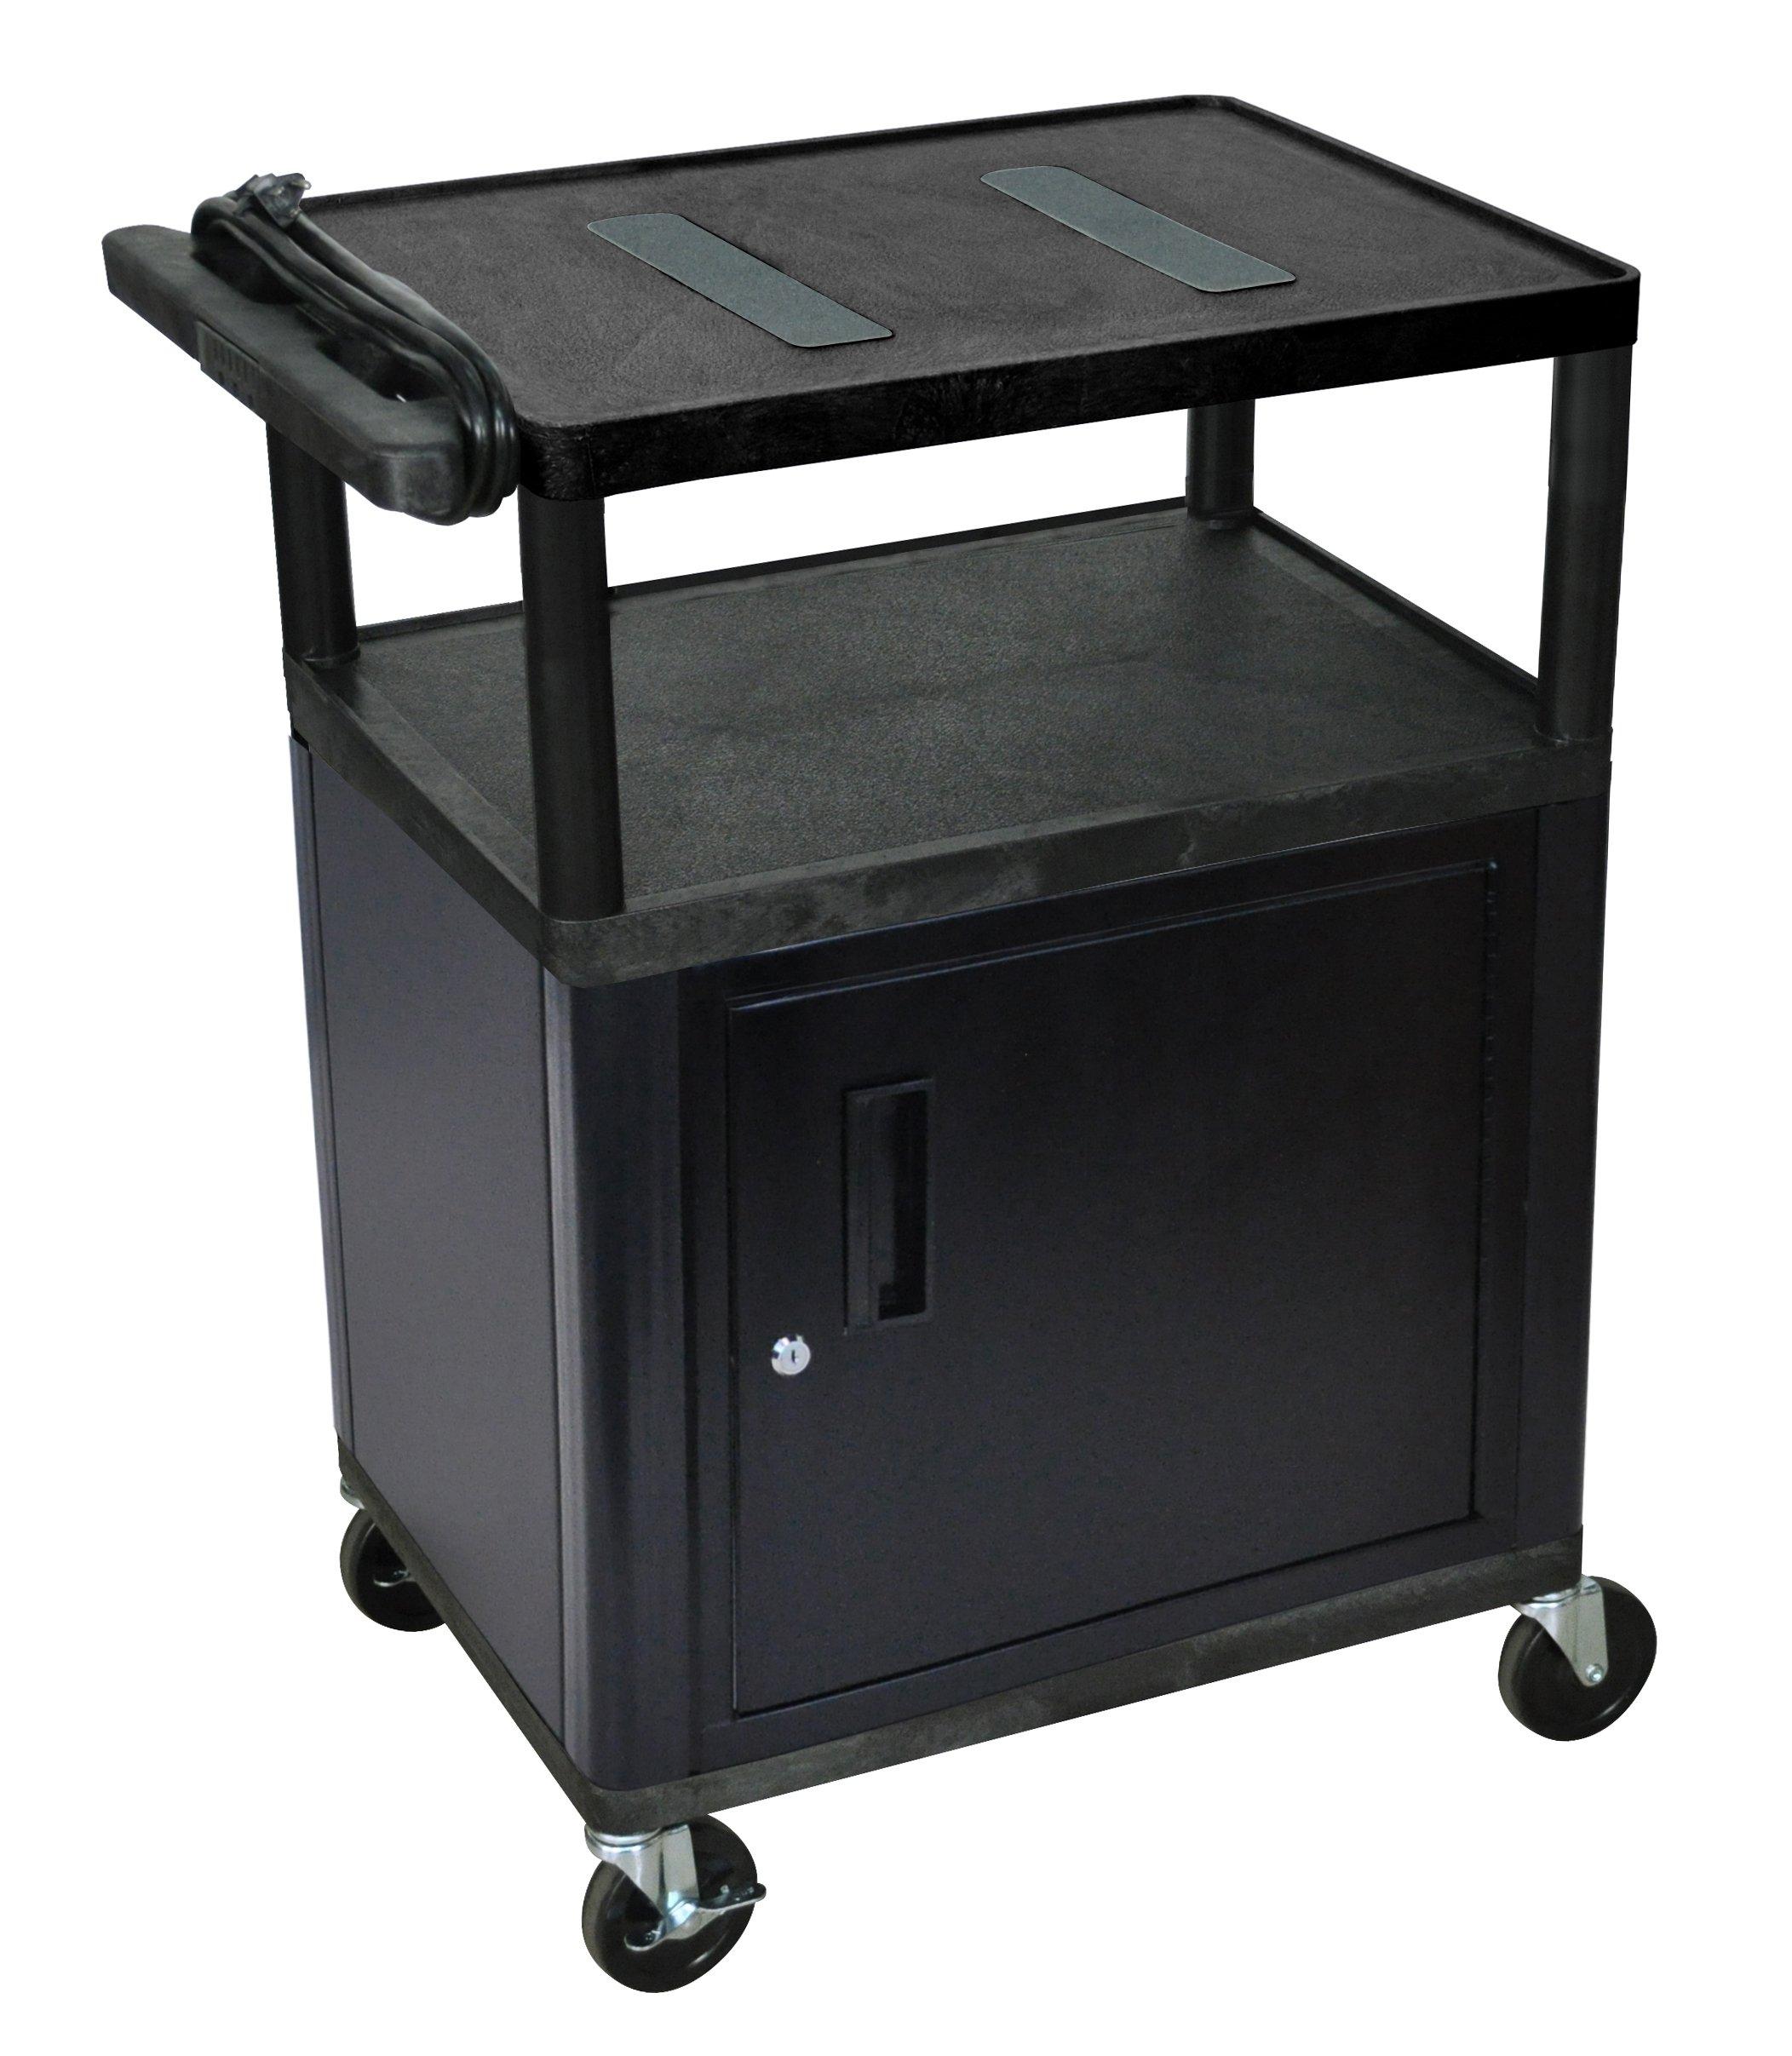 LUXOR LE34C-B Endura A/V Cart with Endura 3 Shelves and Cabinet, Black